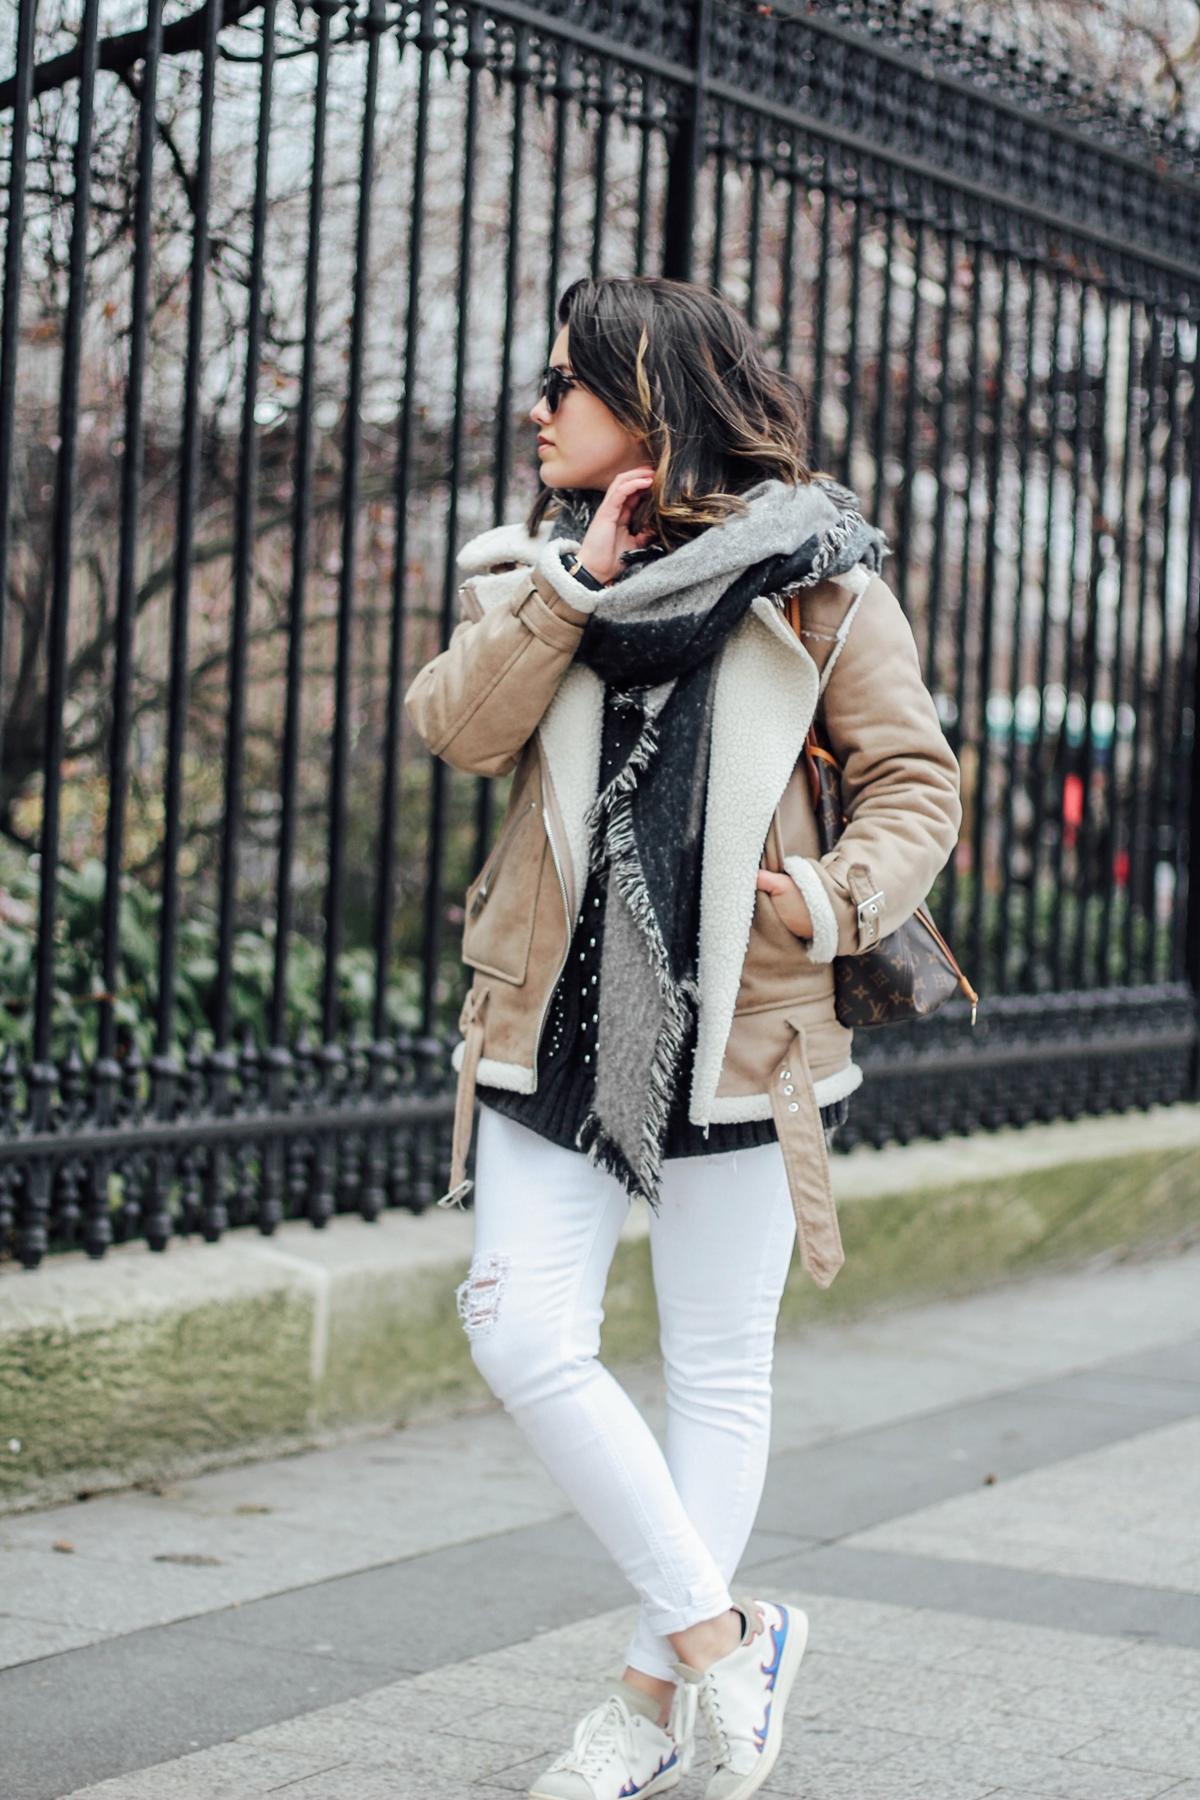 shearling-jacket-beige-isabel-marant-sneakers-streetstyle